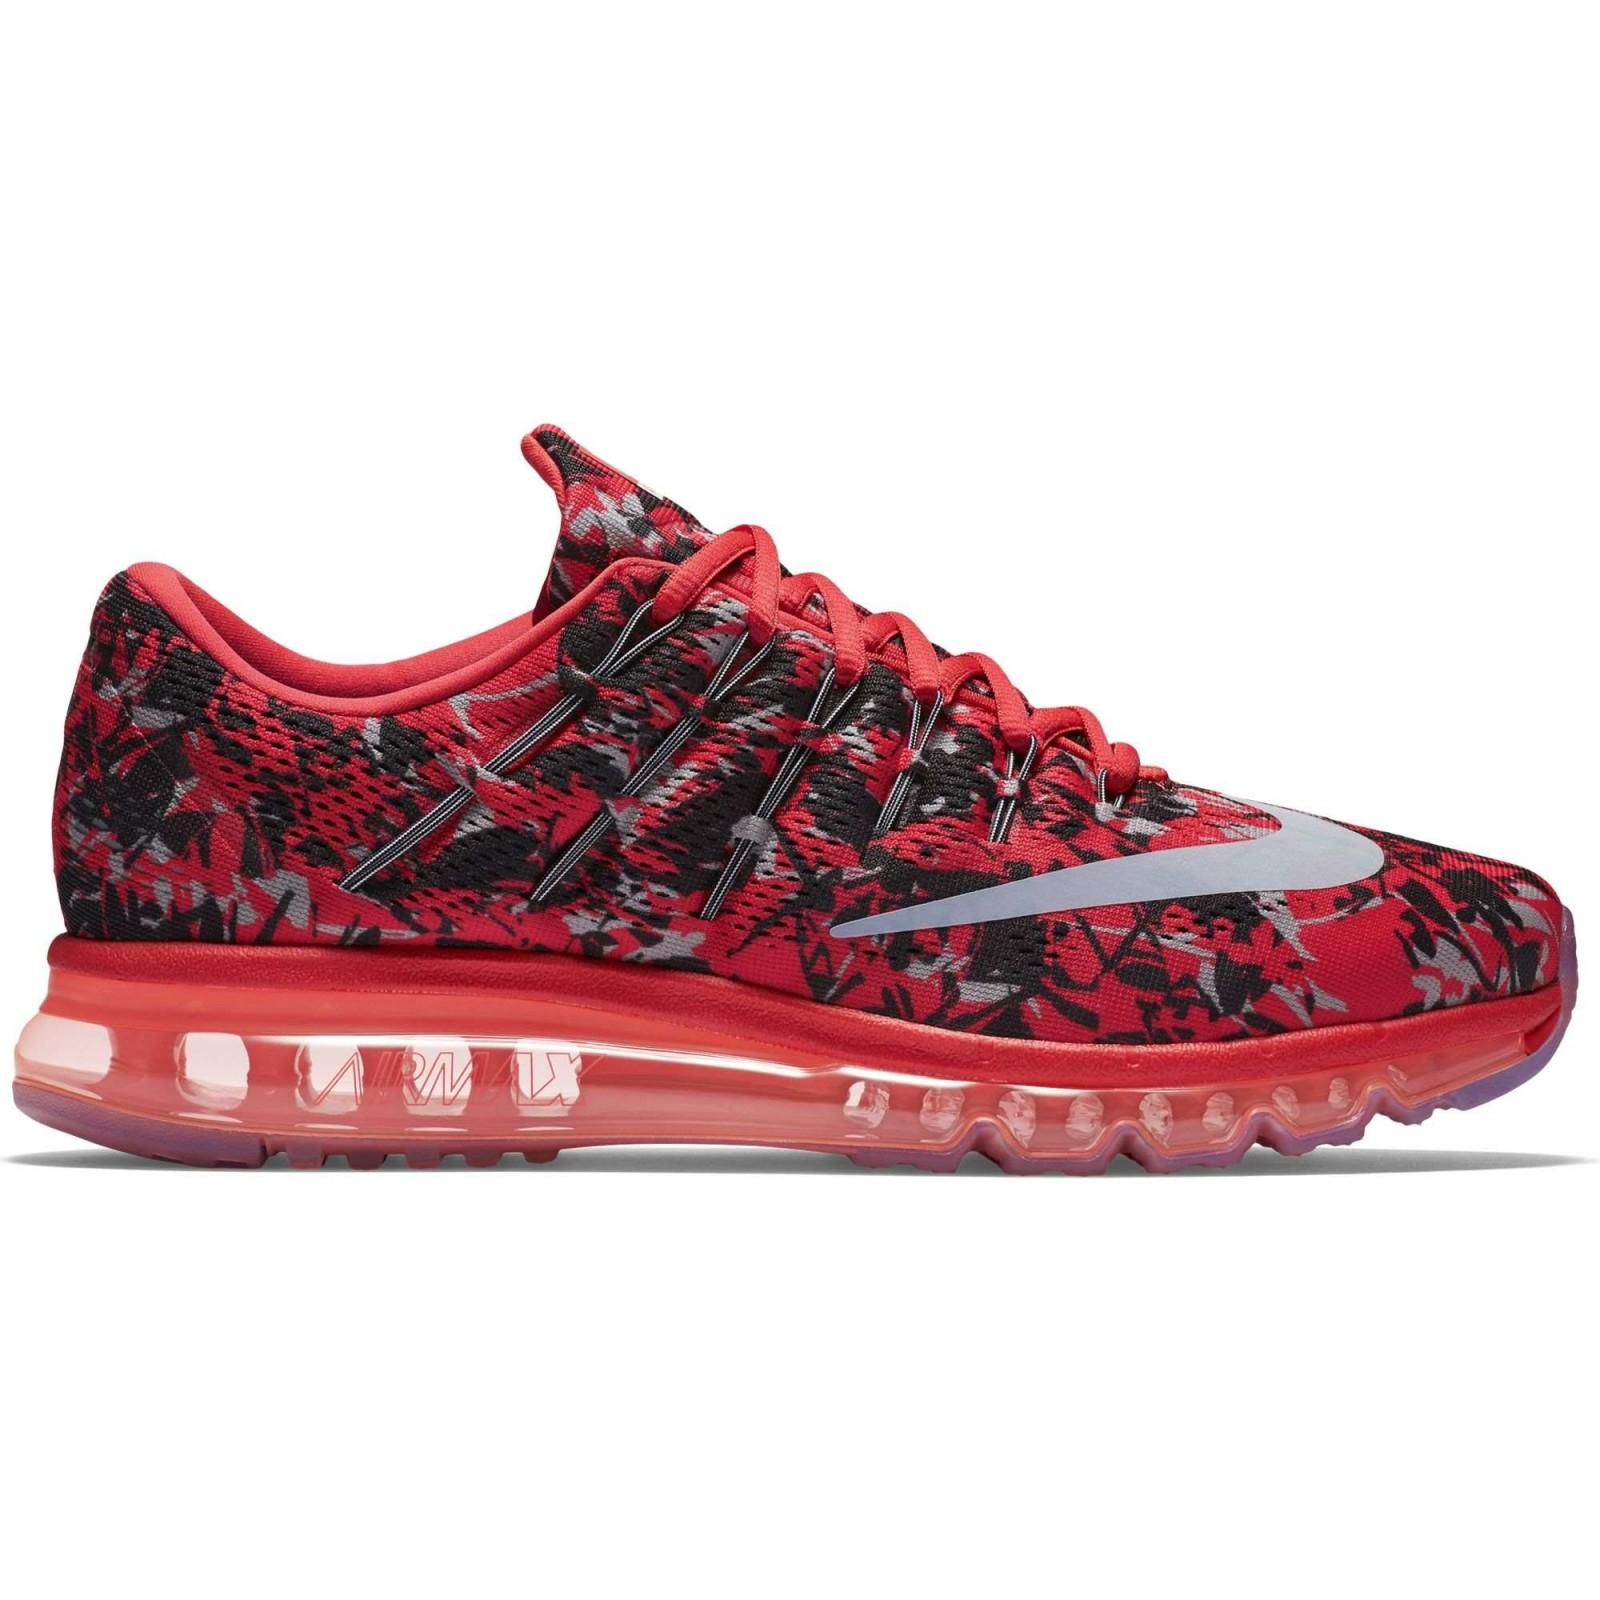 02a5787a0c9 Pánské boty Nike AIR MAX 2016 PRINT červené